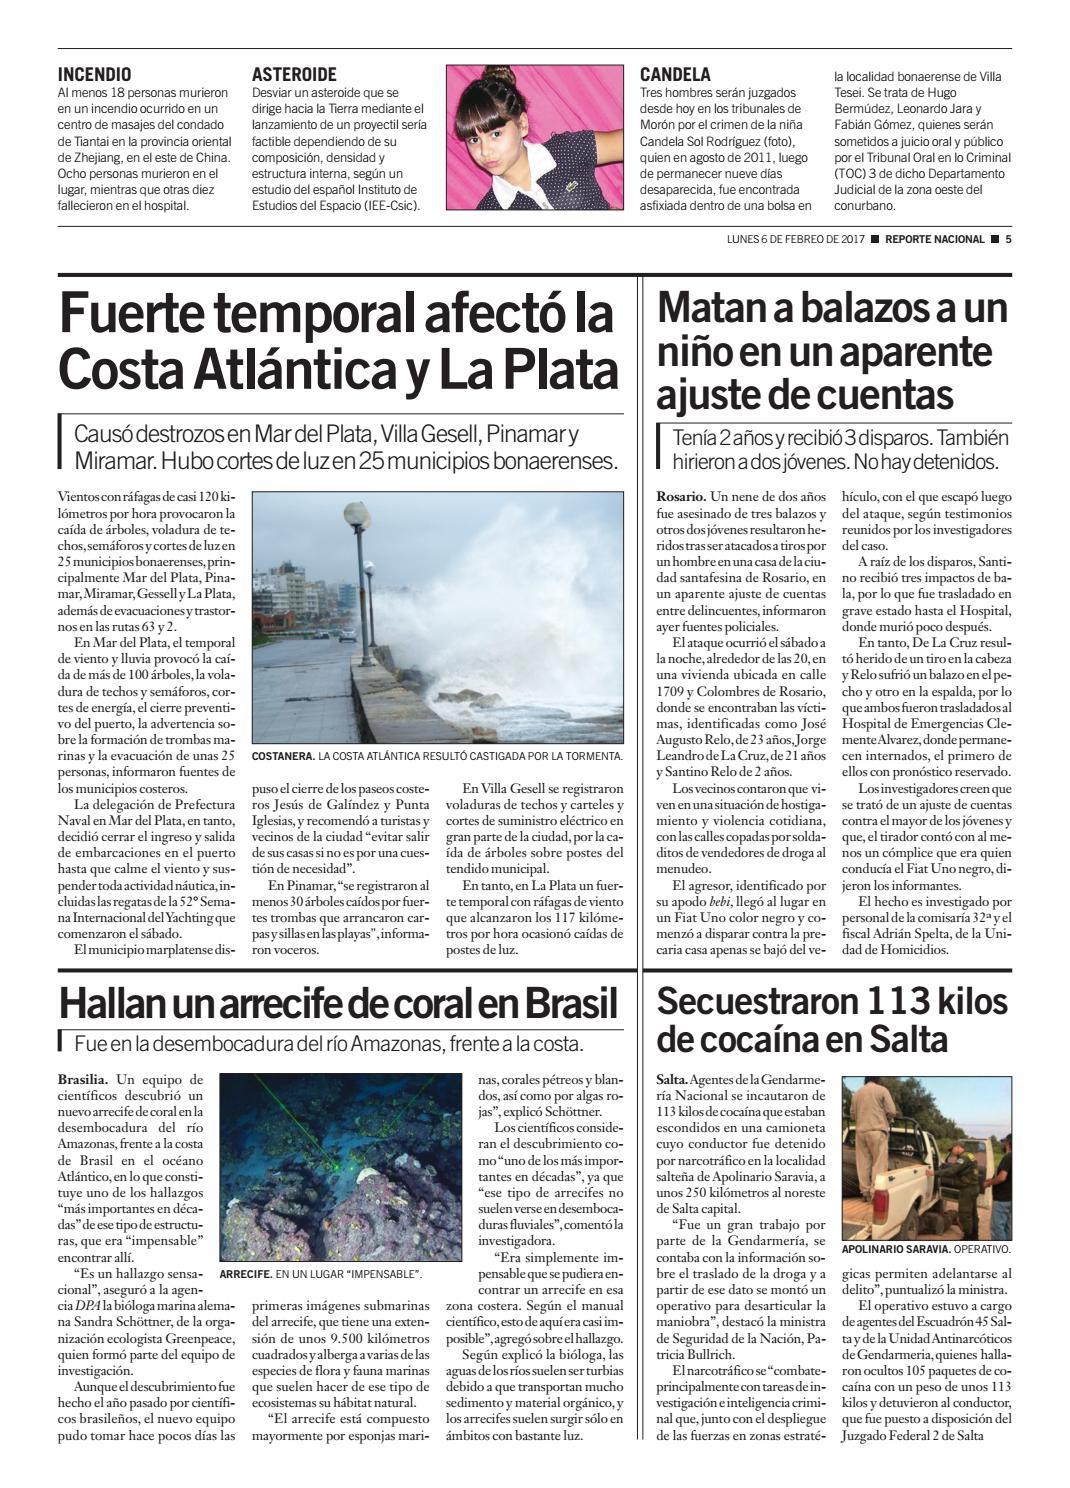 Rn3737 By Reporte Nacional Issuu